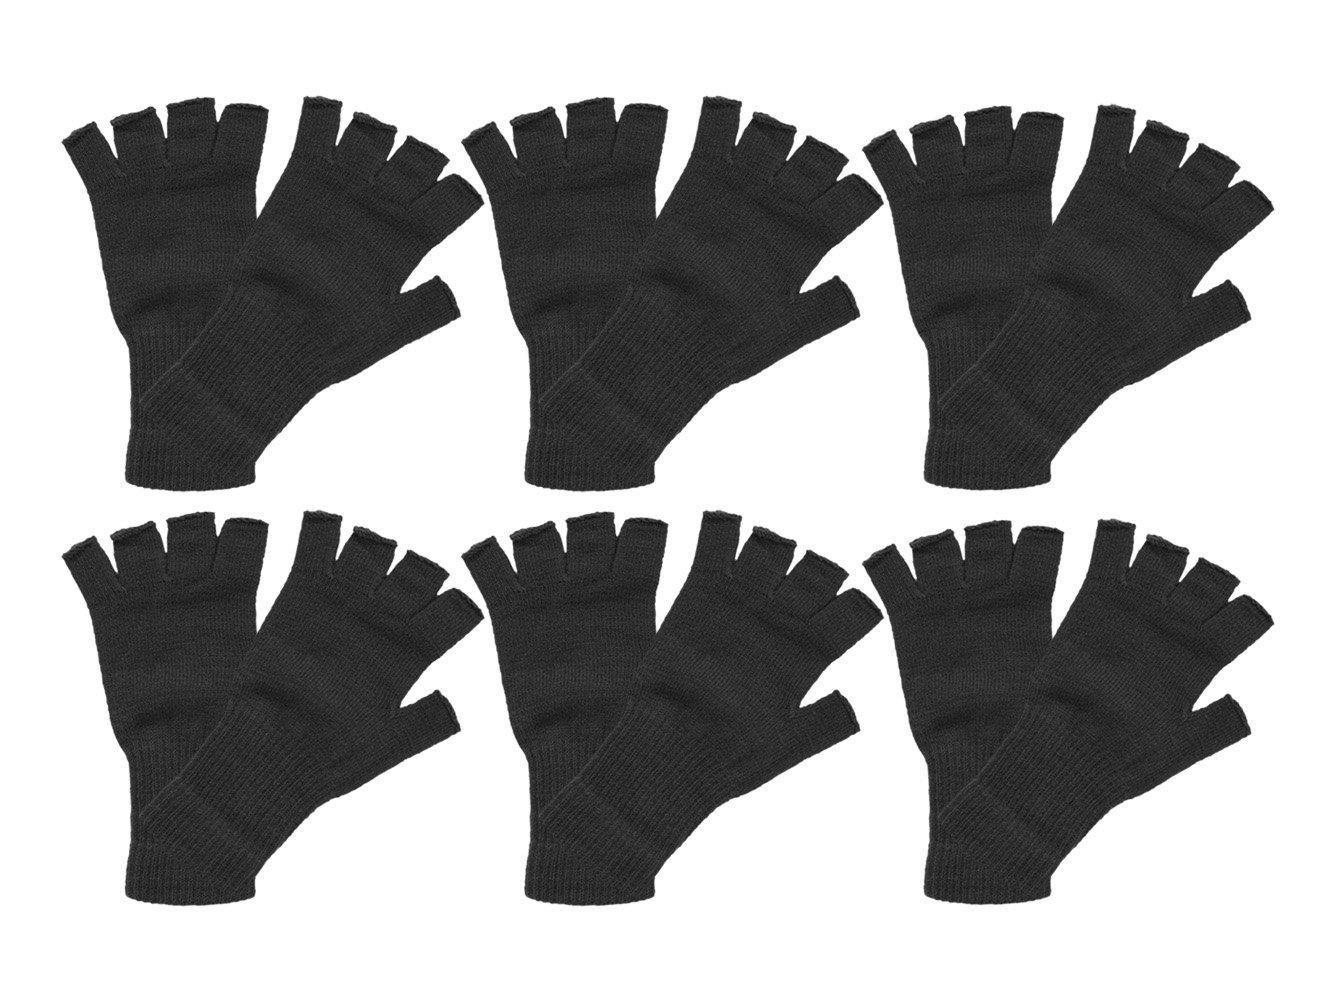 Fingerless Knit Gloves 6 pieces, Black